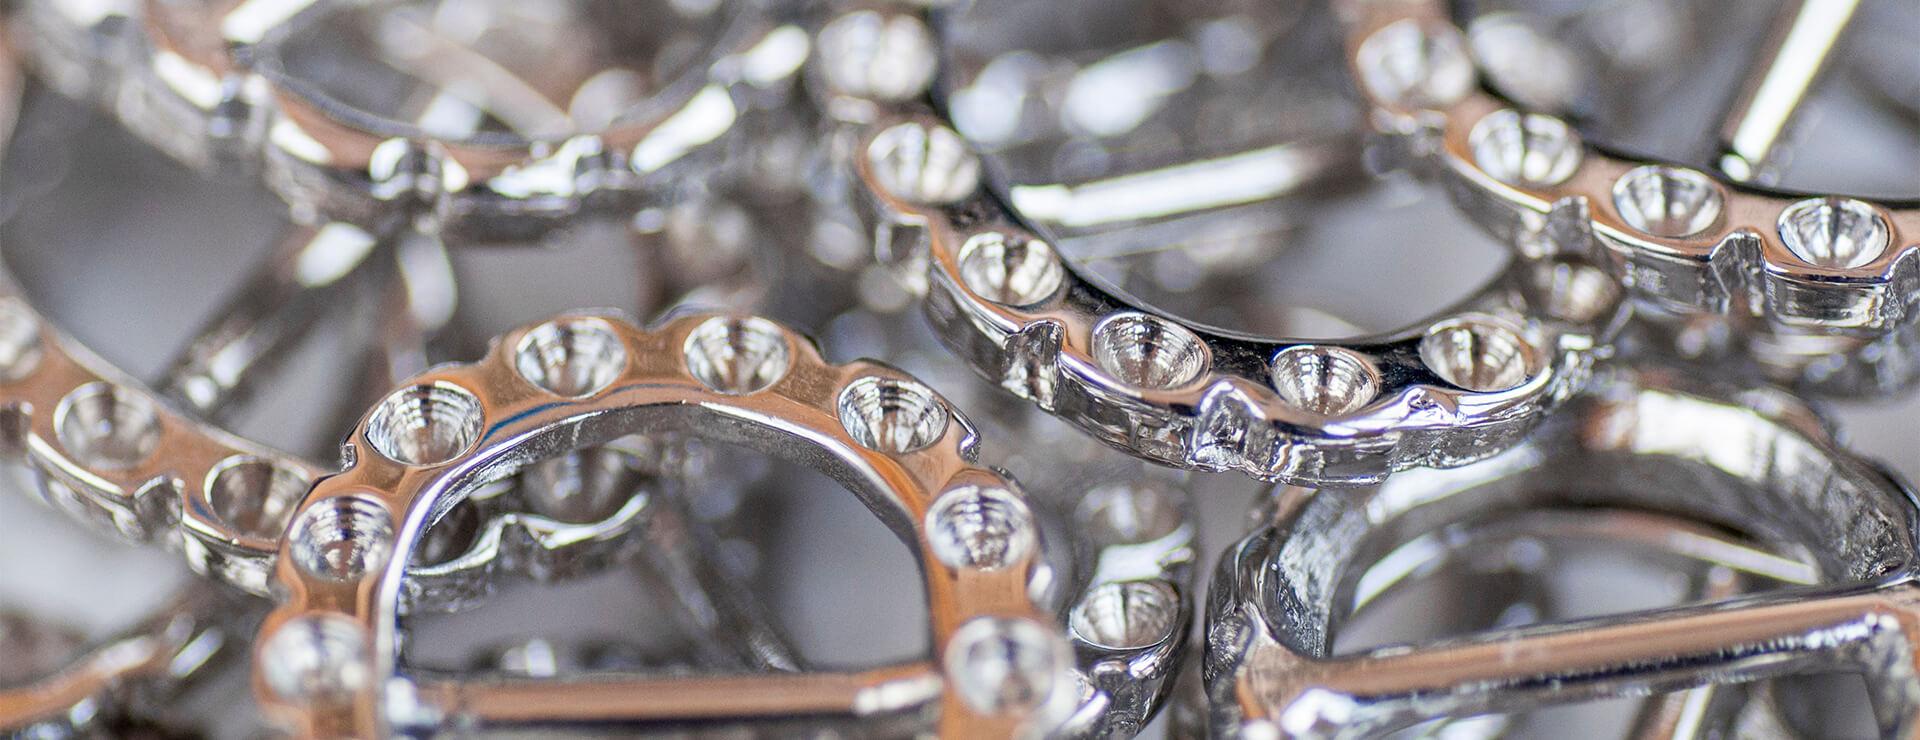 Acabados metálicos en plata